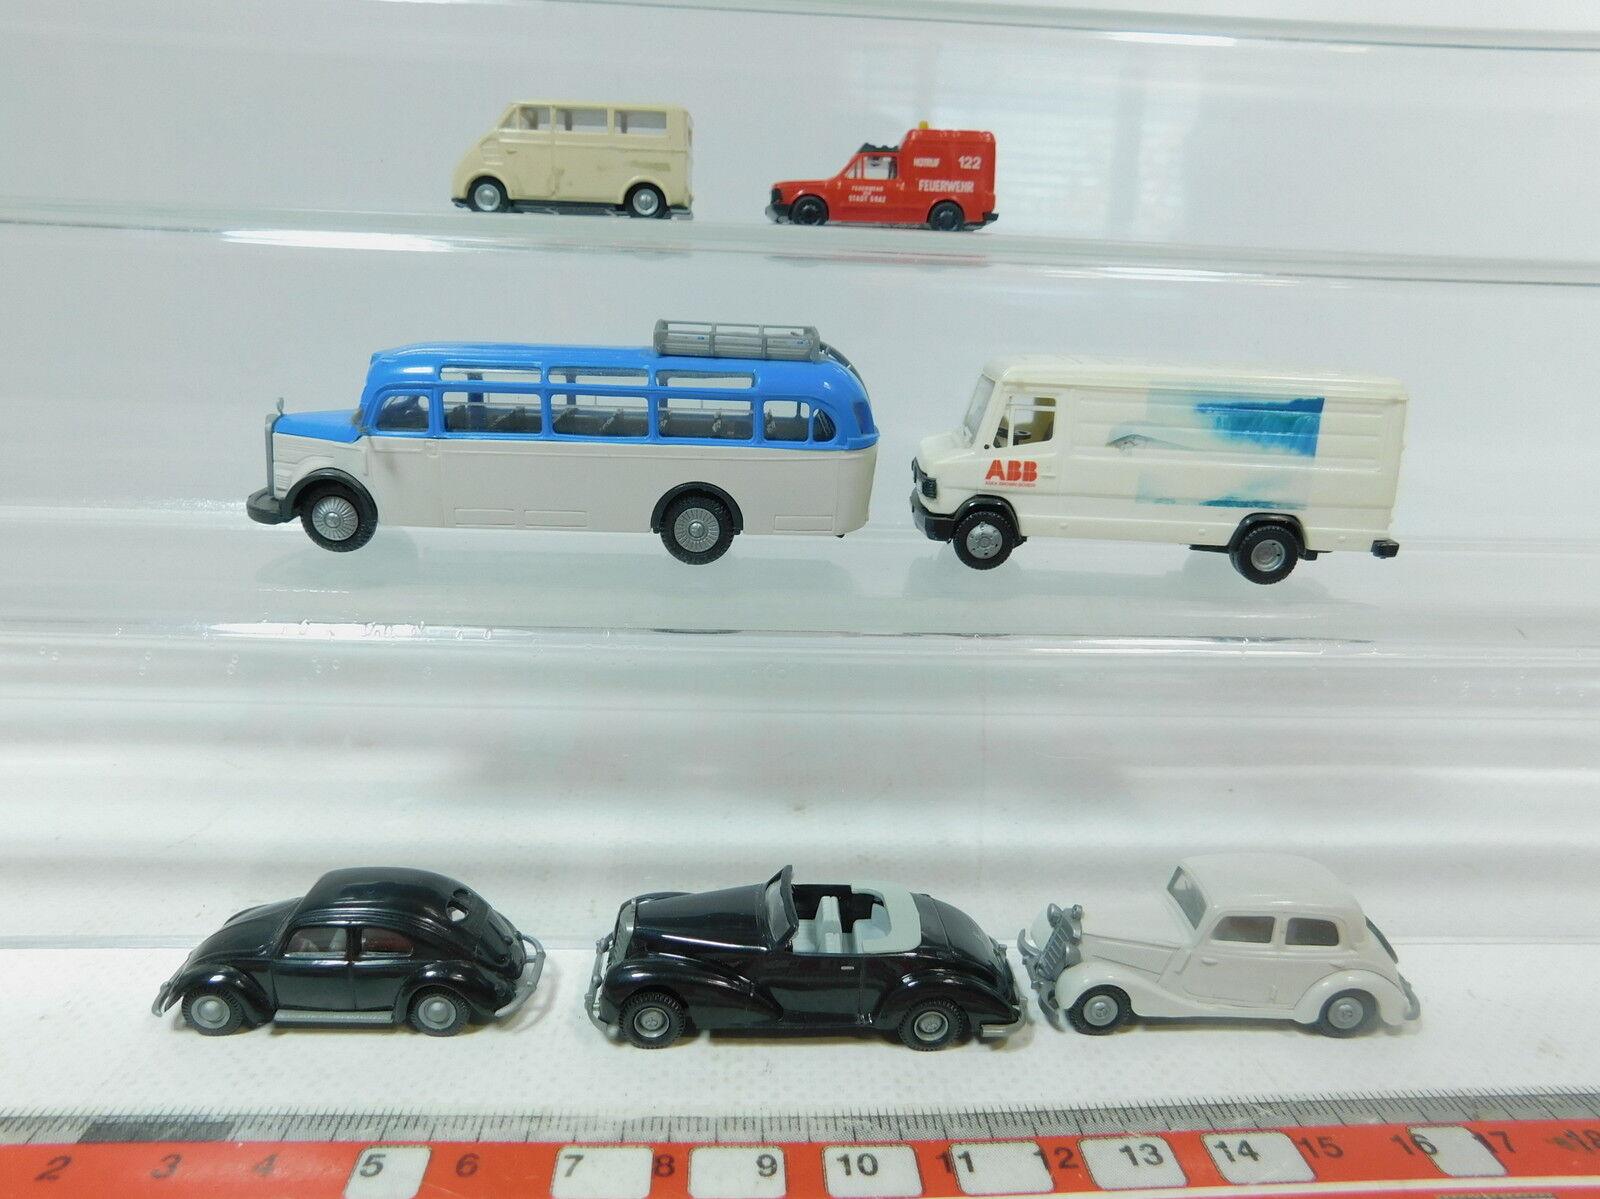 AZ480-0,5x Praline H0 (1 (1 (1 87) Modell  MB 507 D+O 3500+170+300+Fiat+DKW etc c9e14e